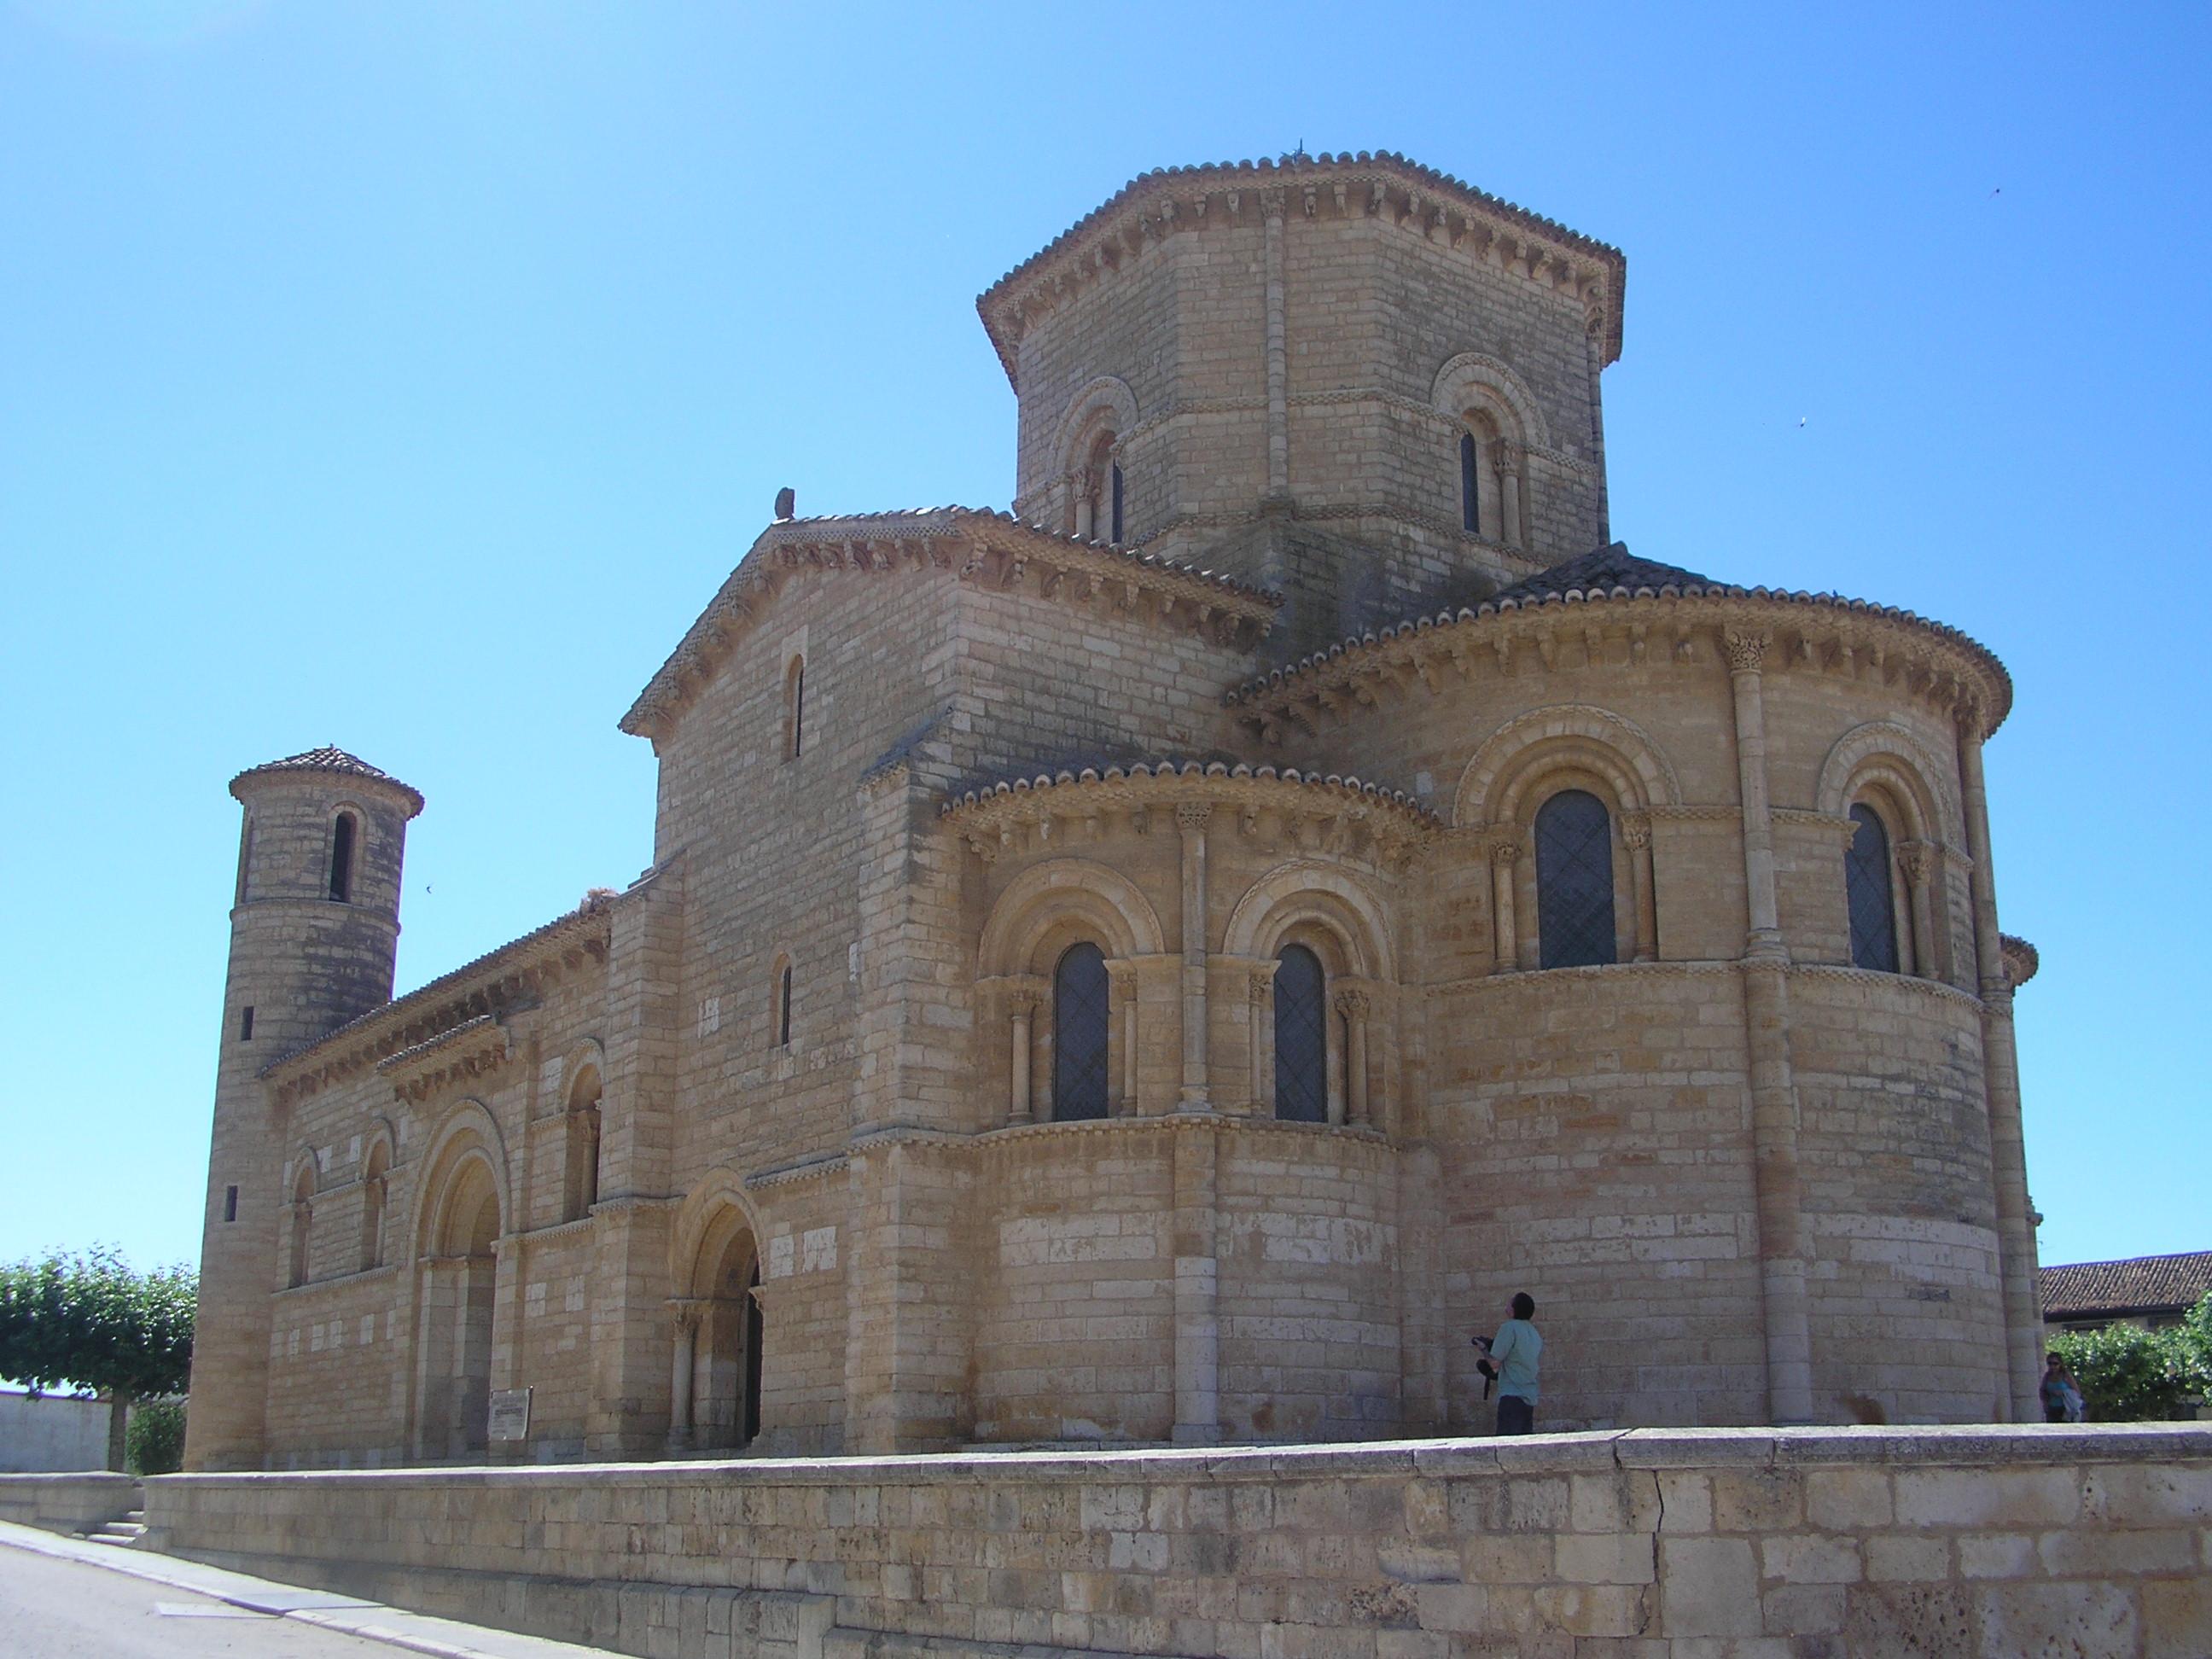 Arte romanico arte romanoci - Arquitectos ponferrada ...